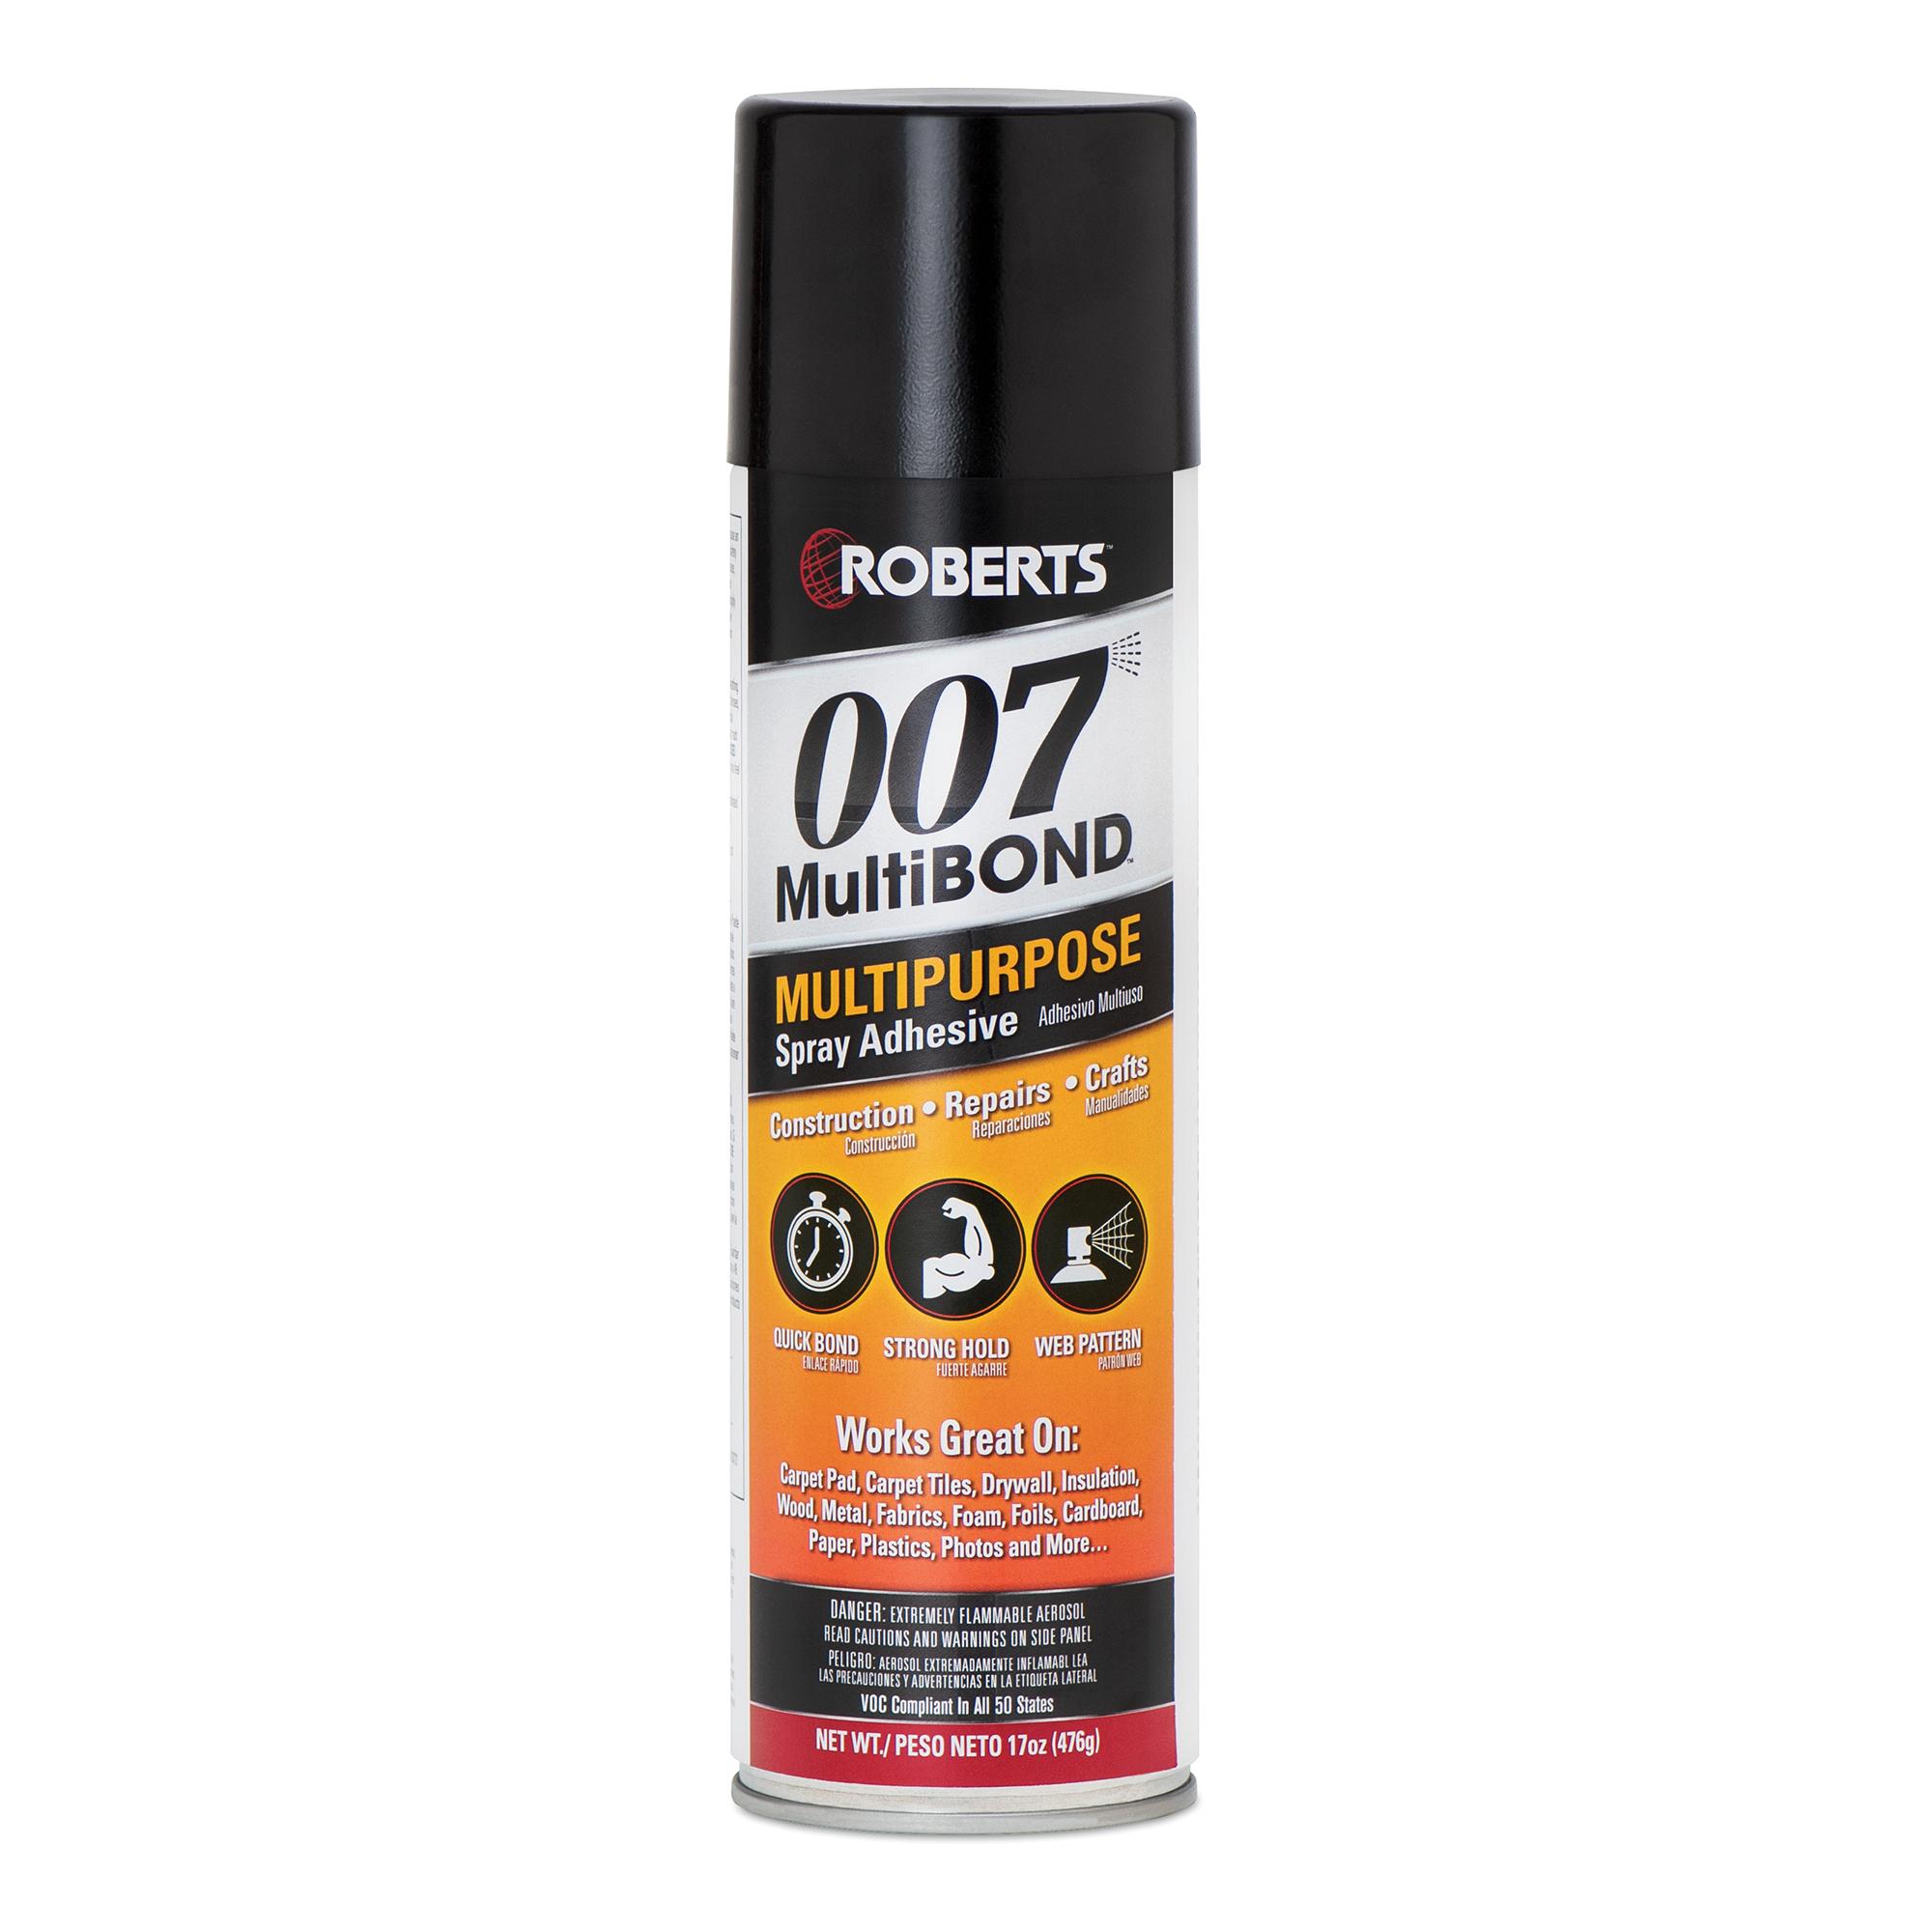 MultiBond Multipurpose Spray Adhesive